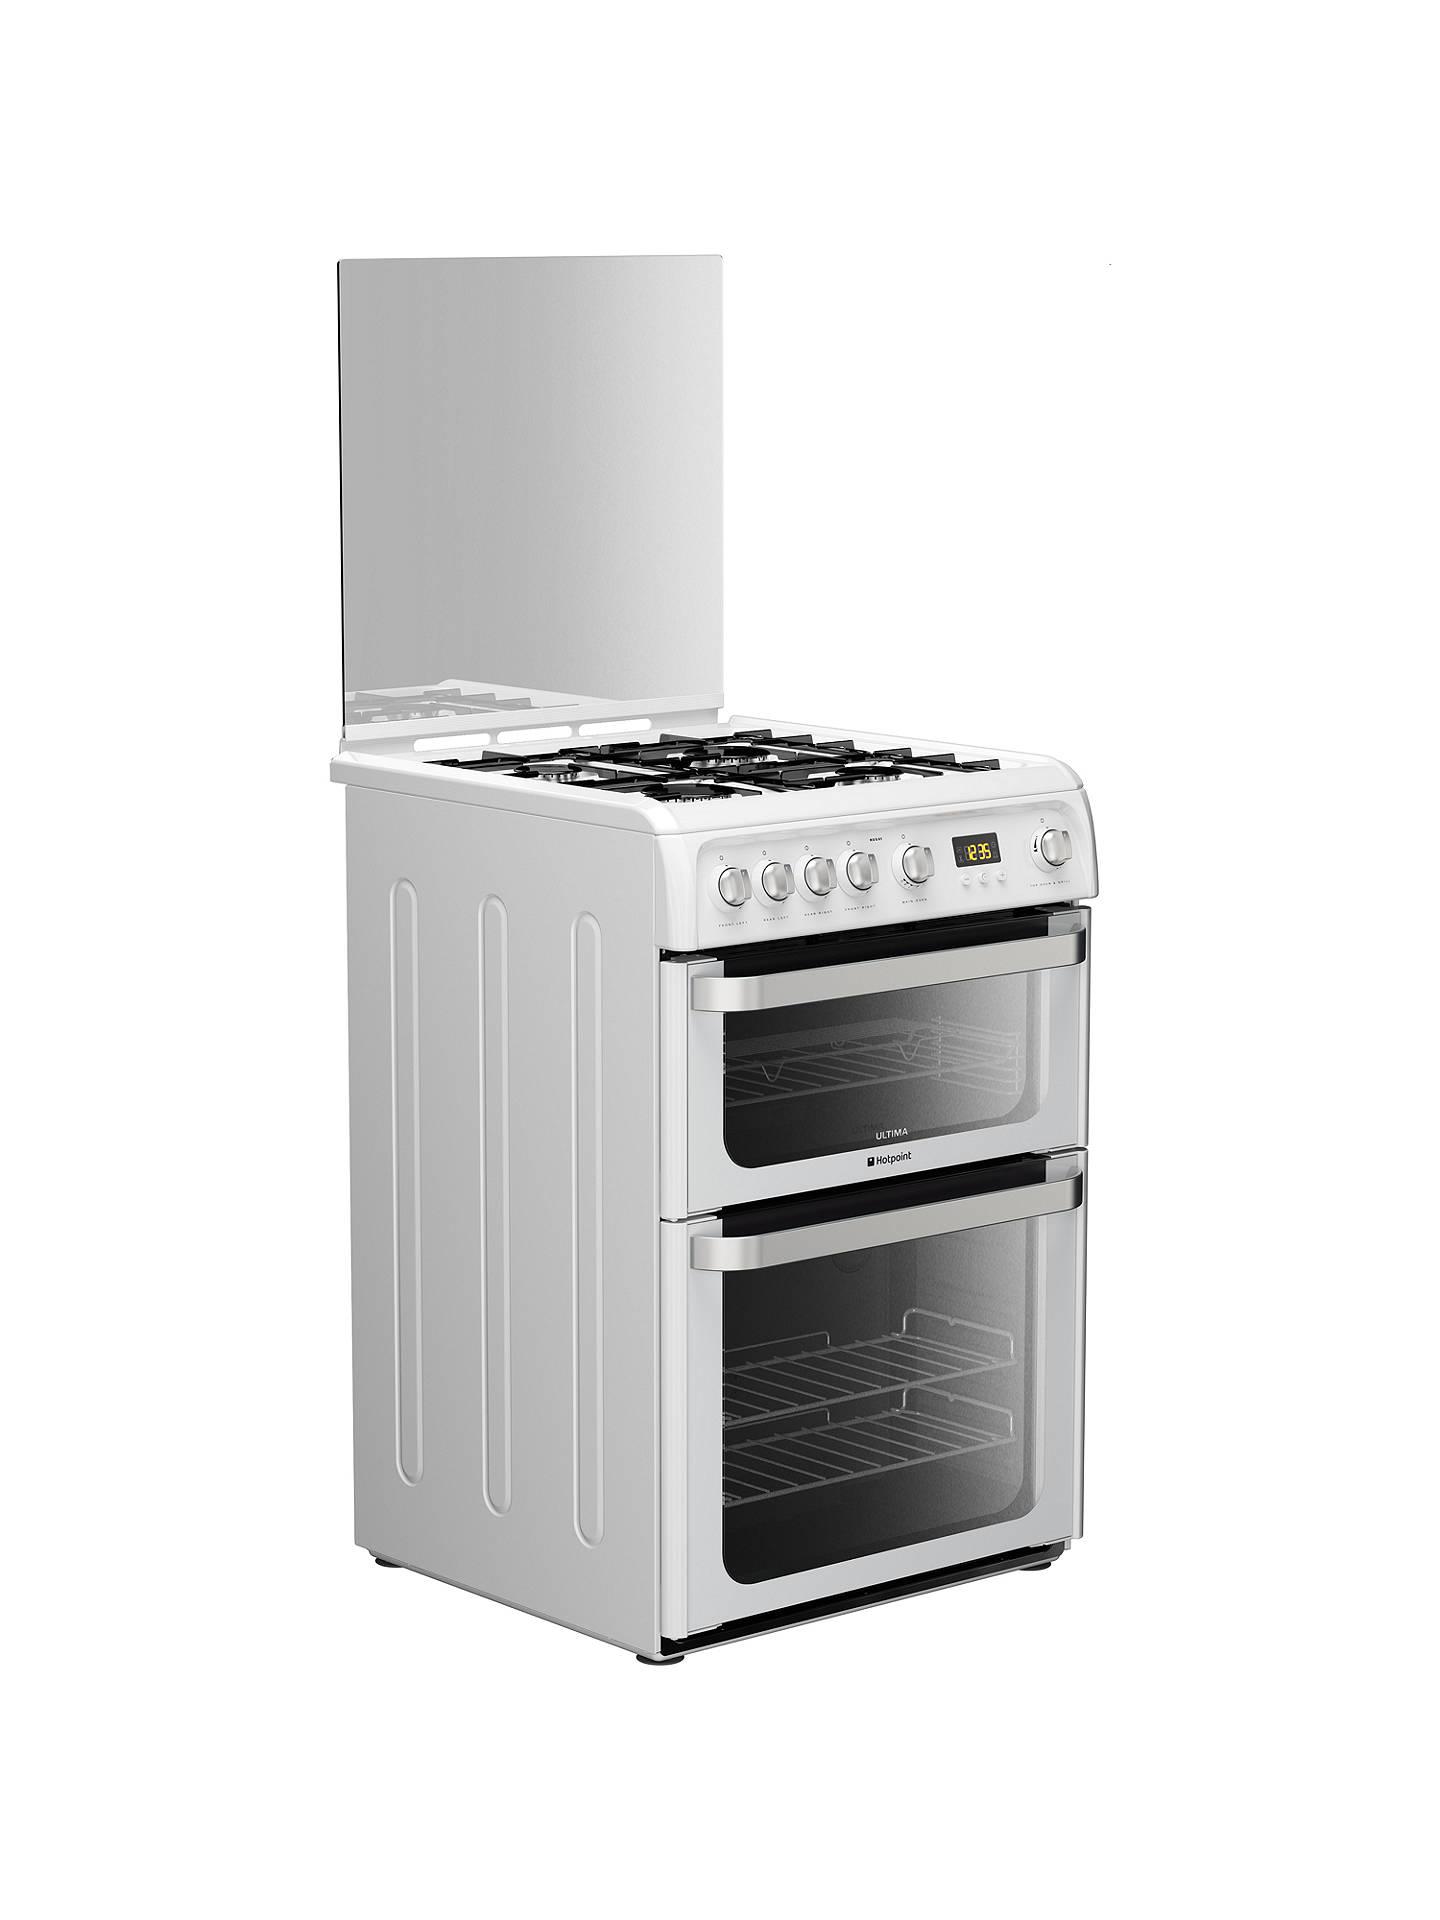 hotpoint hug61p ultima gas cooker white at john lewis. Black Bedroom Furniture Sets. Home Design Ideas